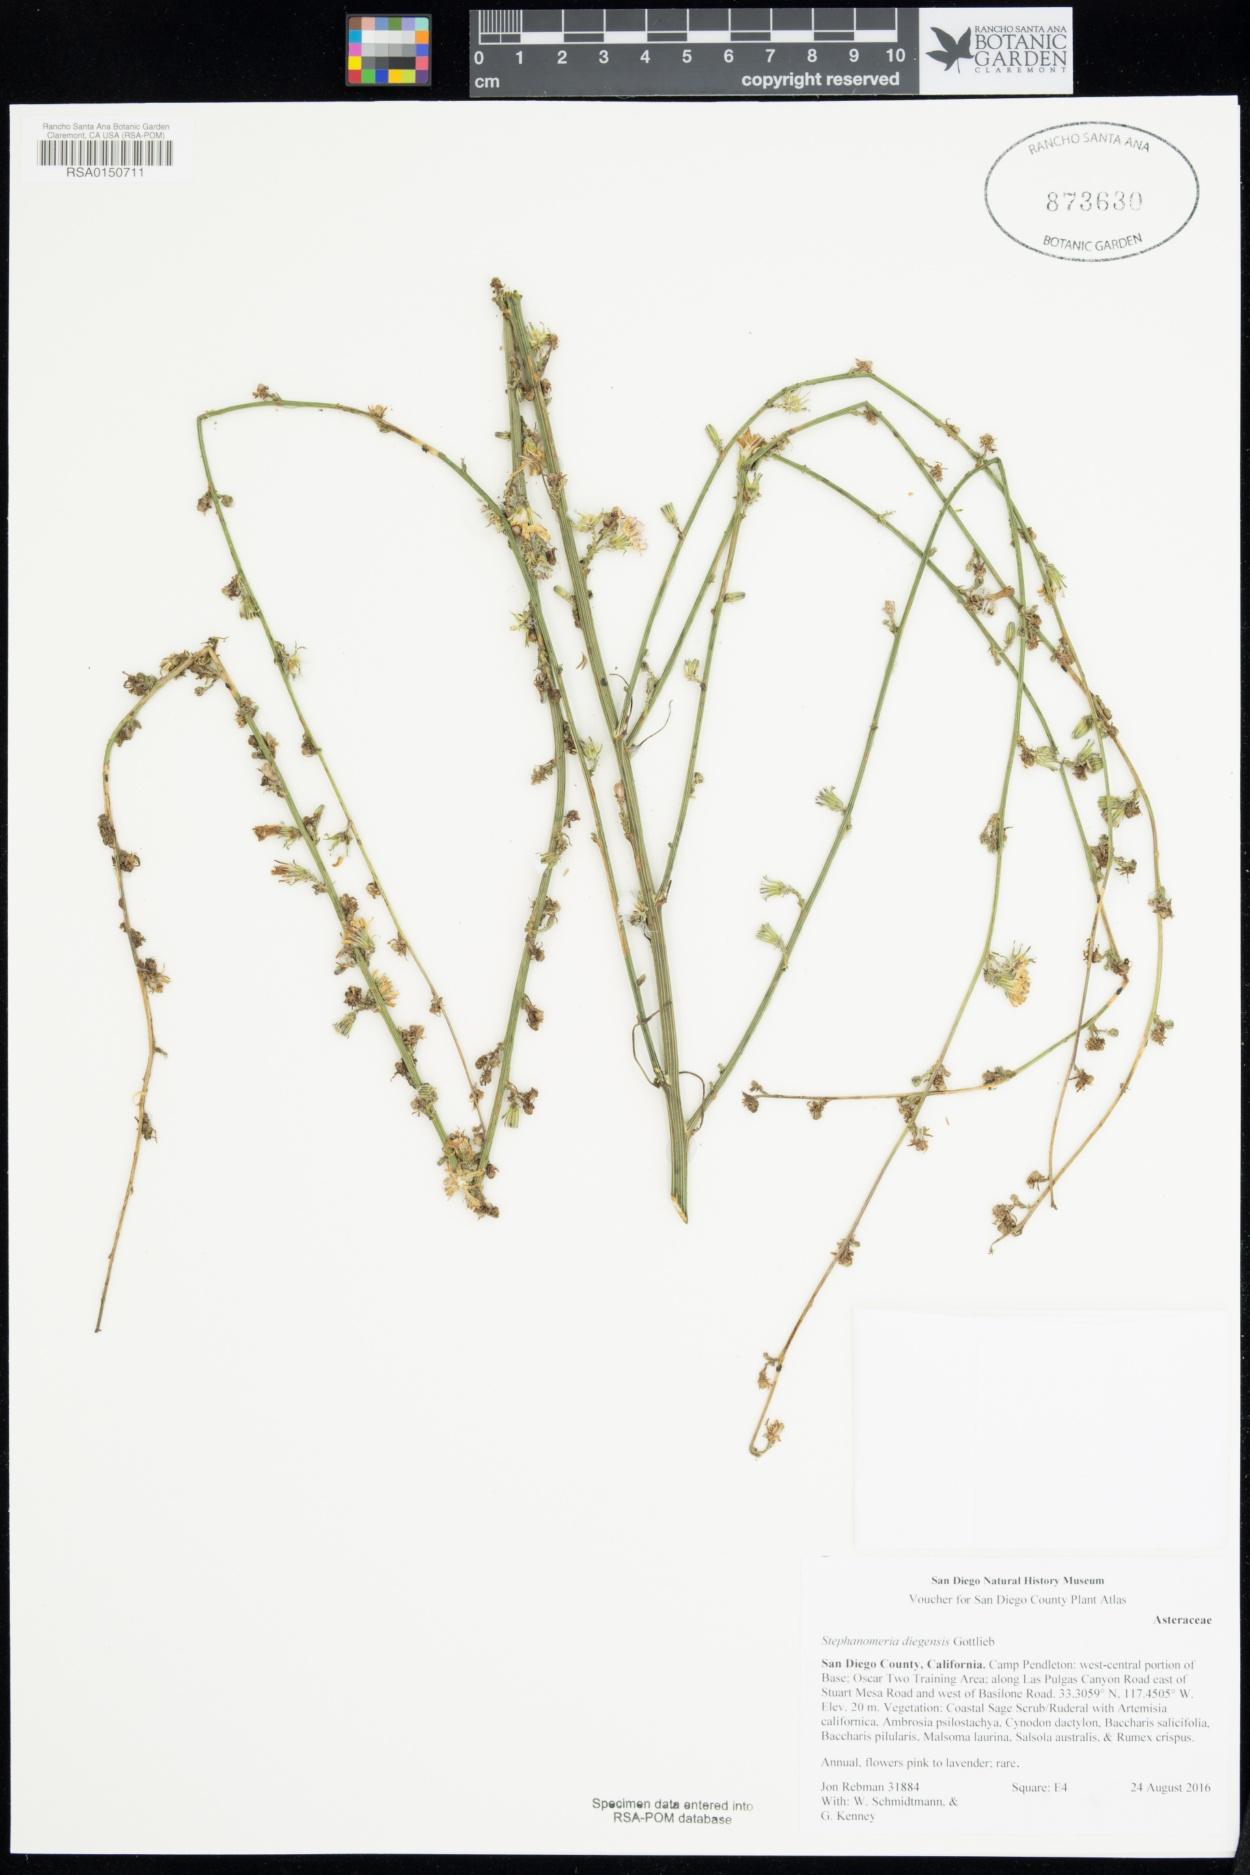 Stephanomeria image